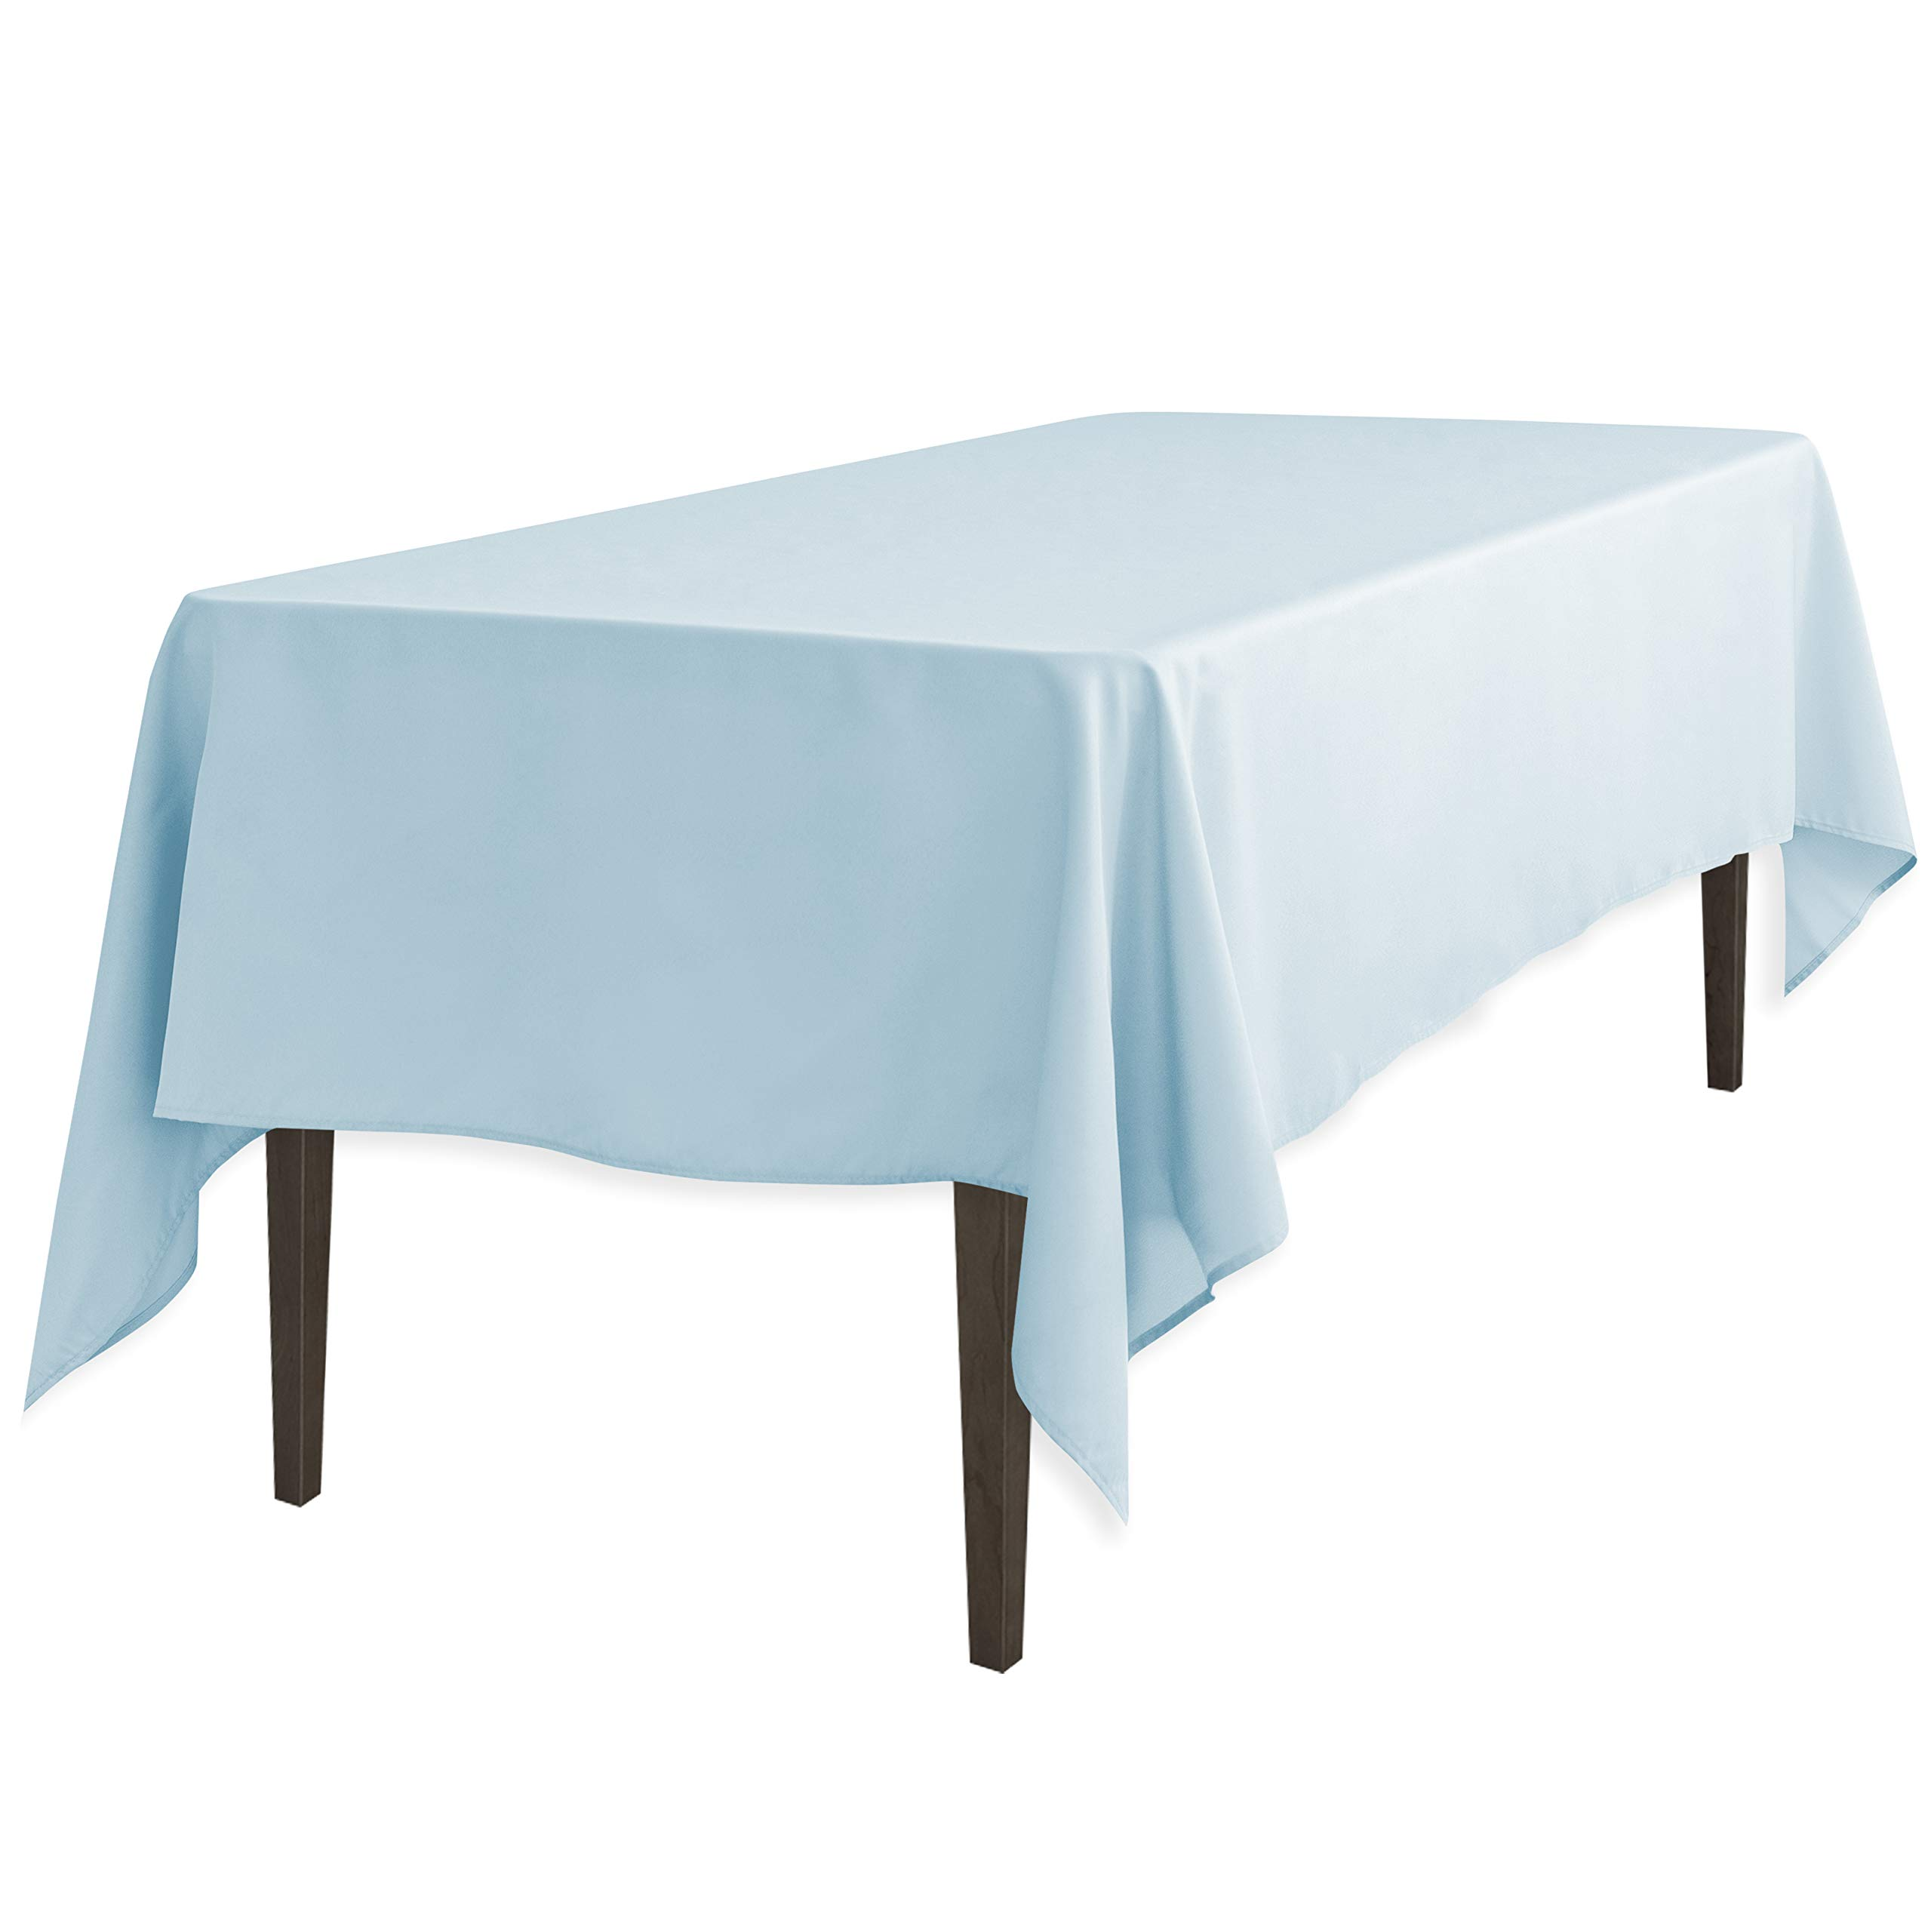 Tablecloth Blue Light